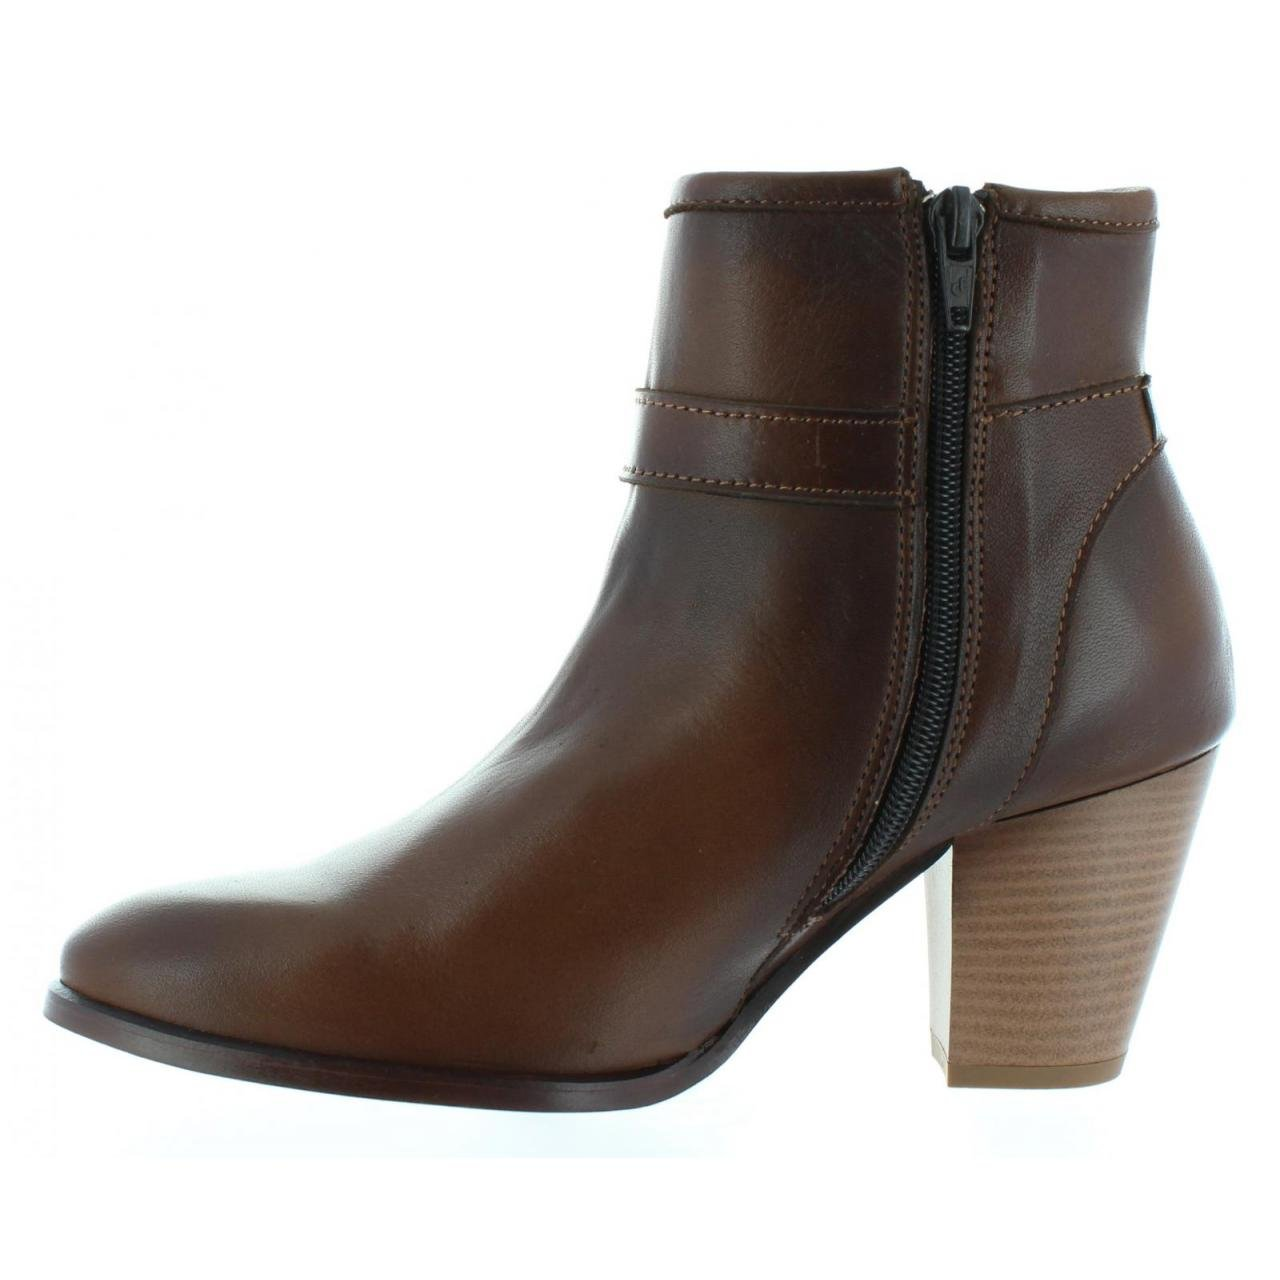 CUMBIA für Stiefel für CUMBIA Damen 30328 Cuero db7fcf